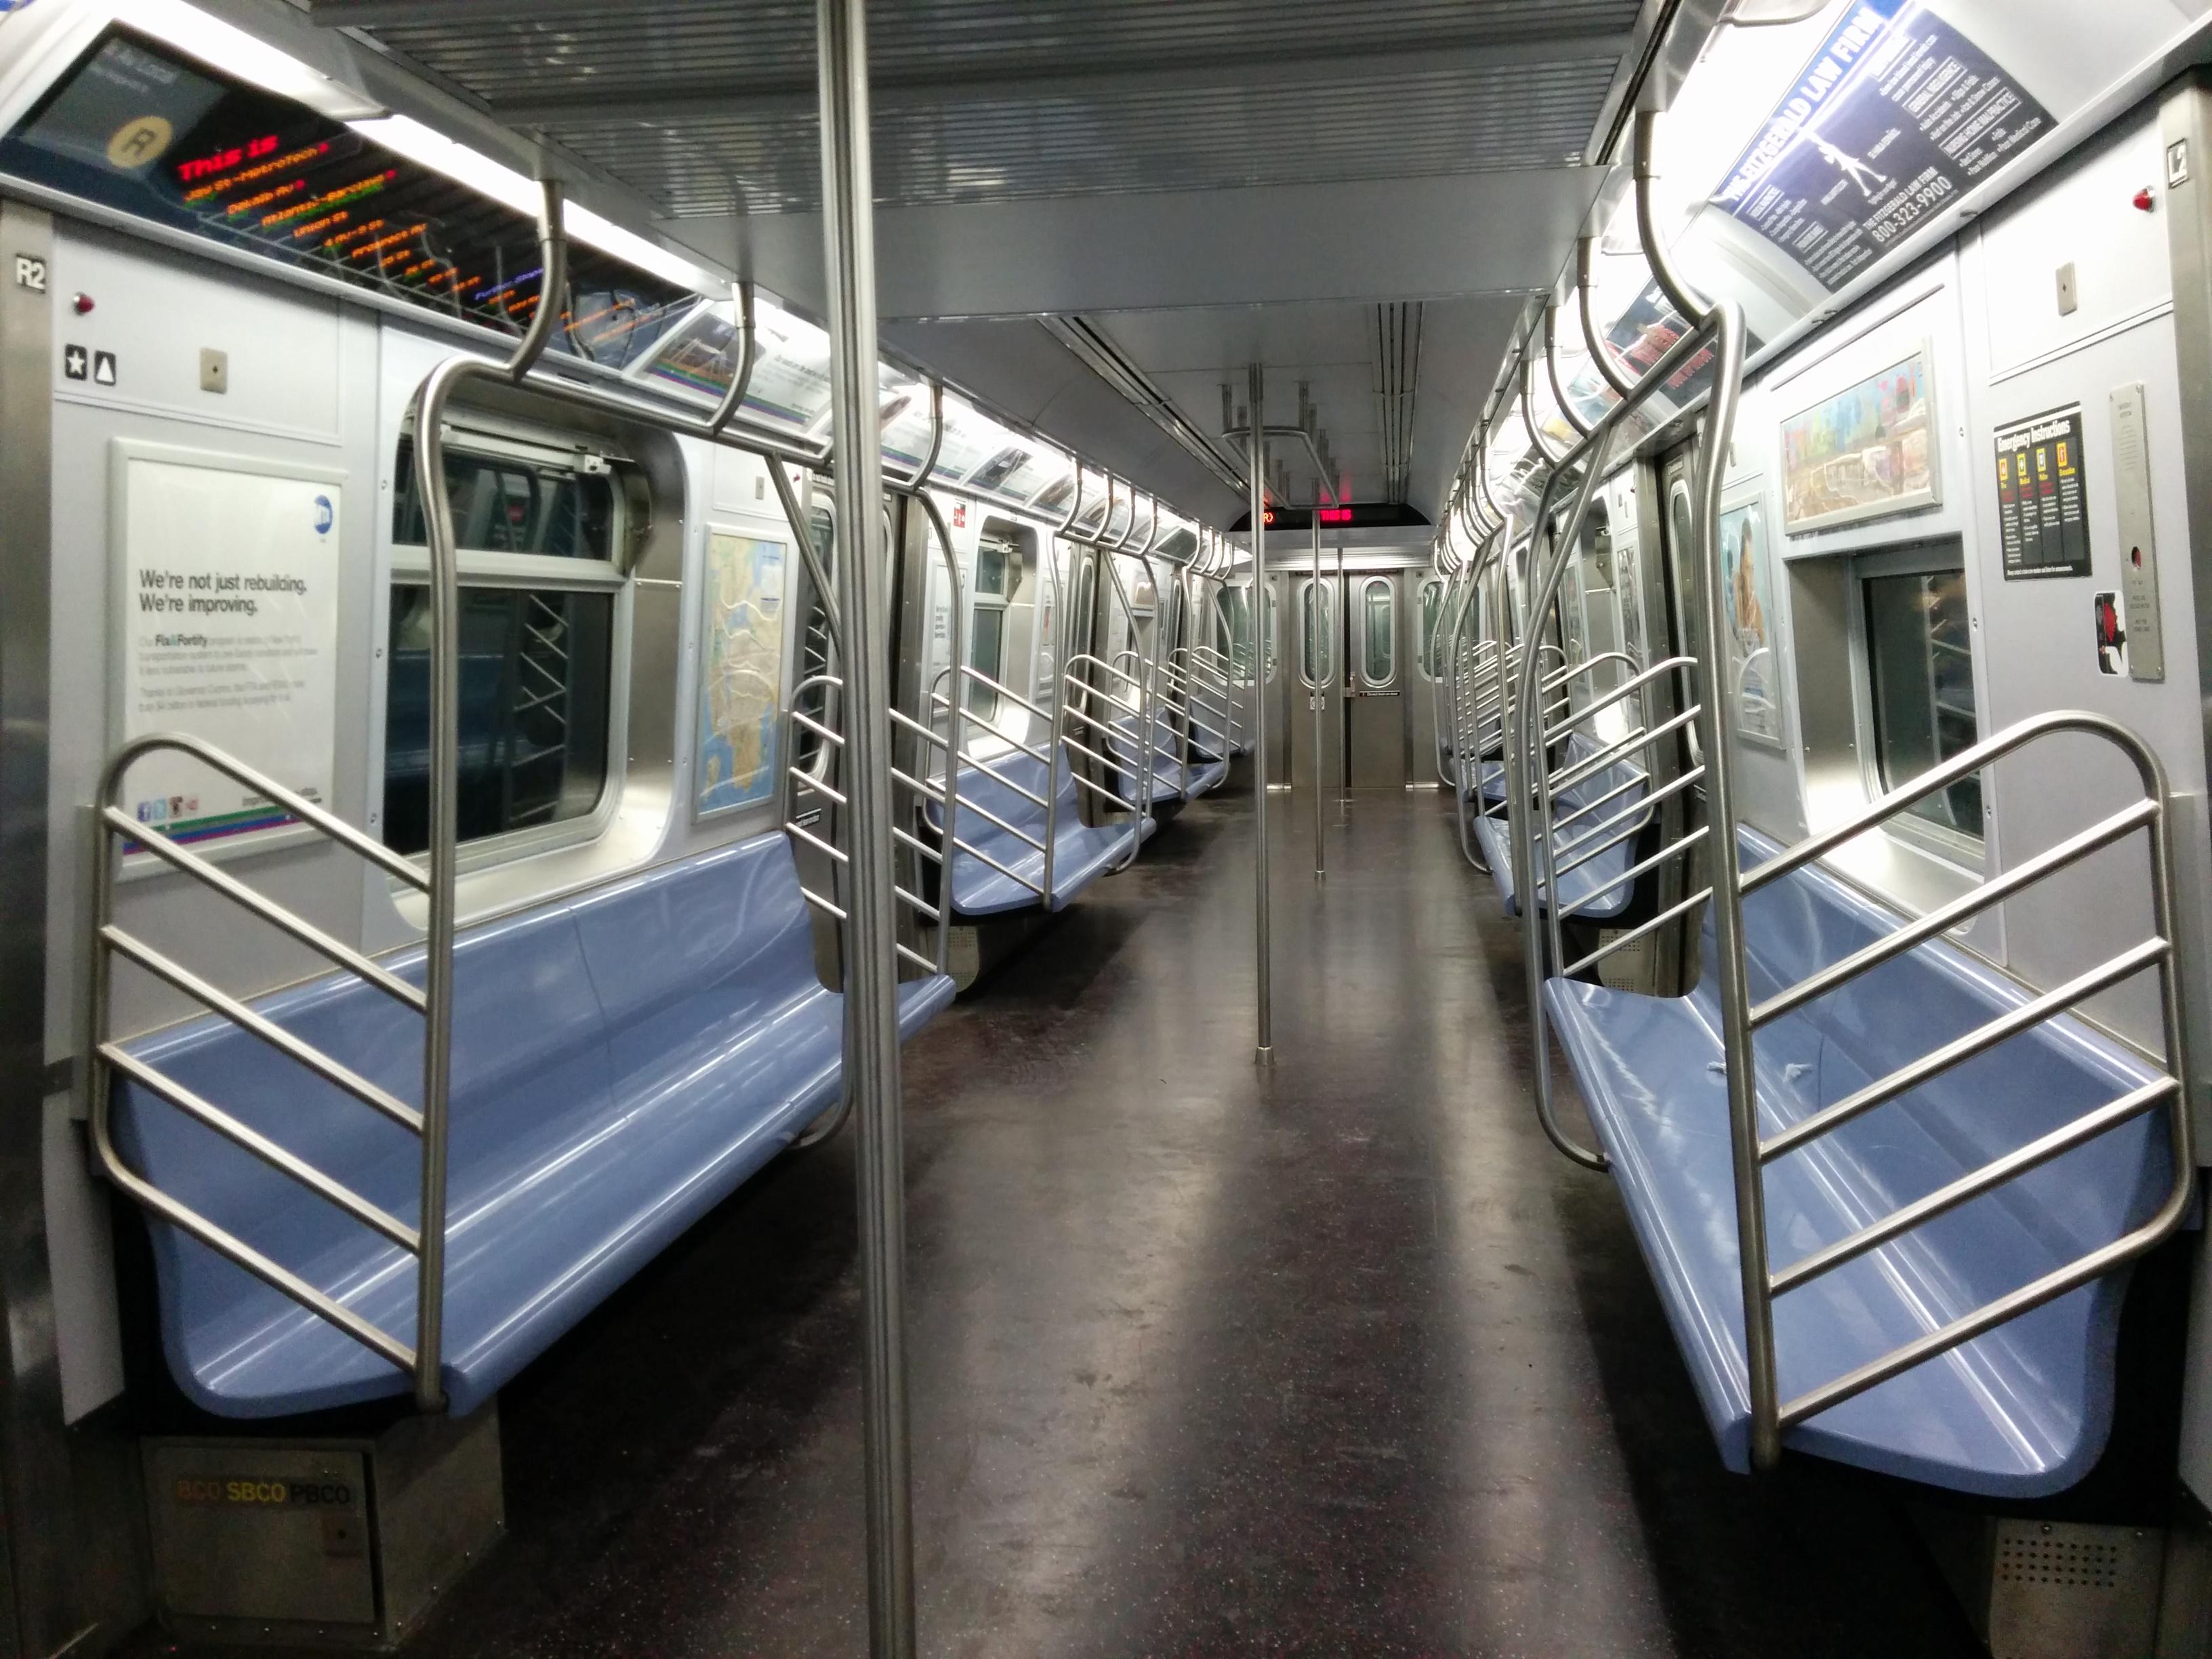 R_train_R160.jpg